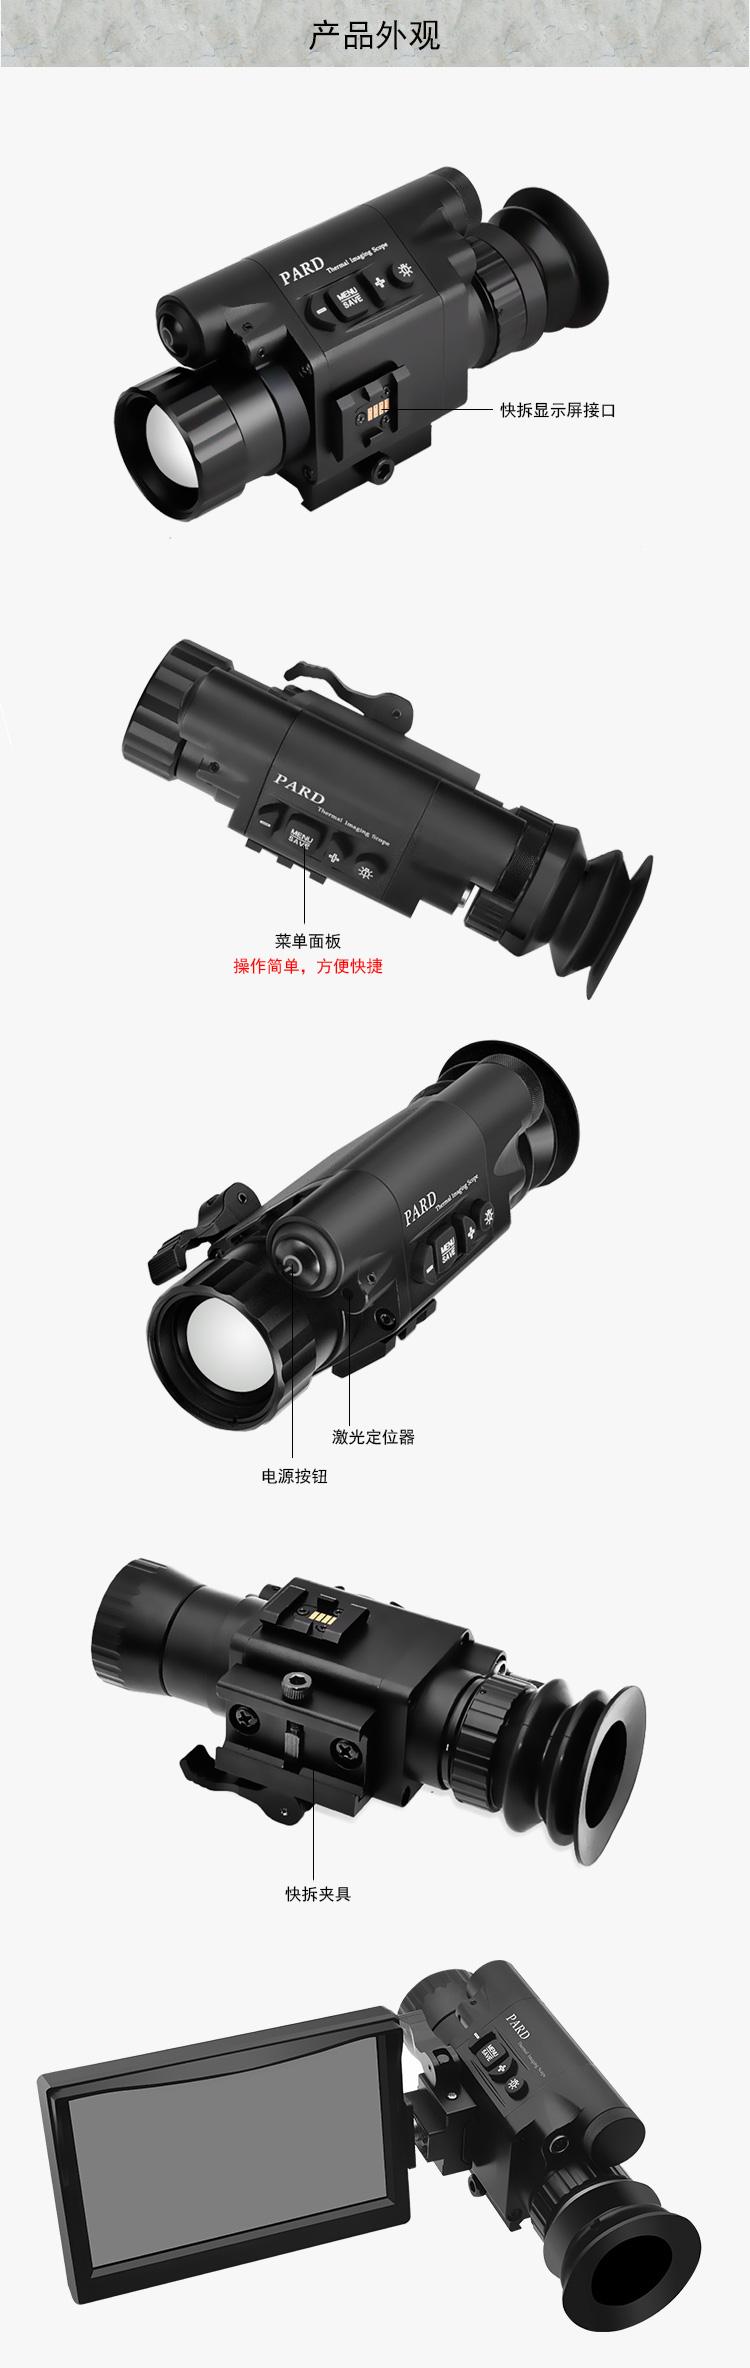 PARD普雷德40S标准版红外热成像夜视瞄准镜